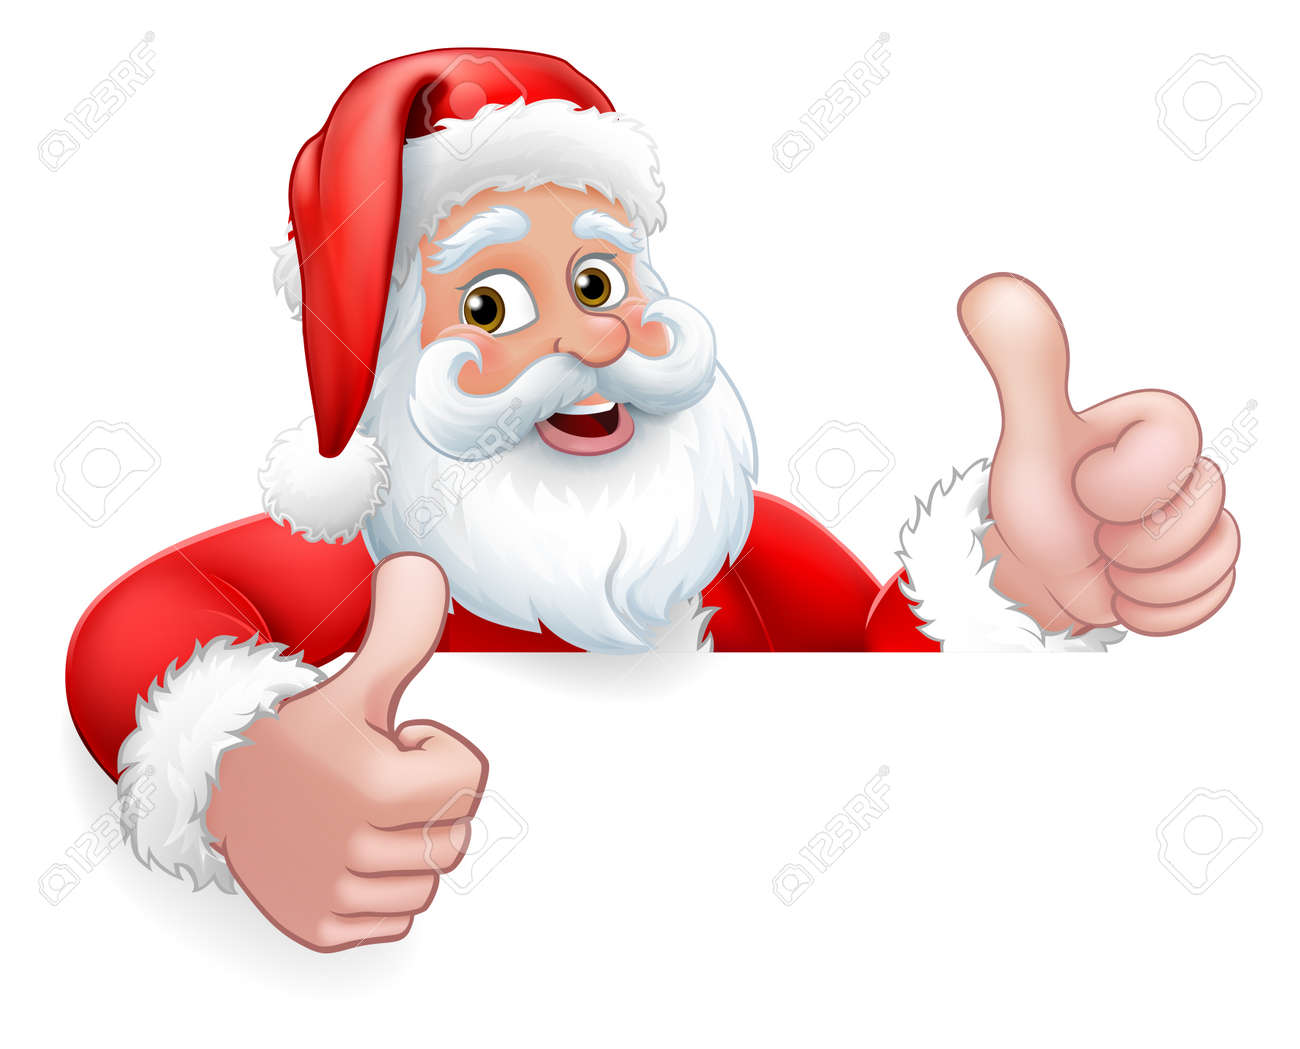 Santa Claus Christmas Peeking Thumbs Up Cartoon - 154268682